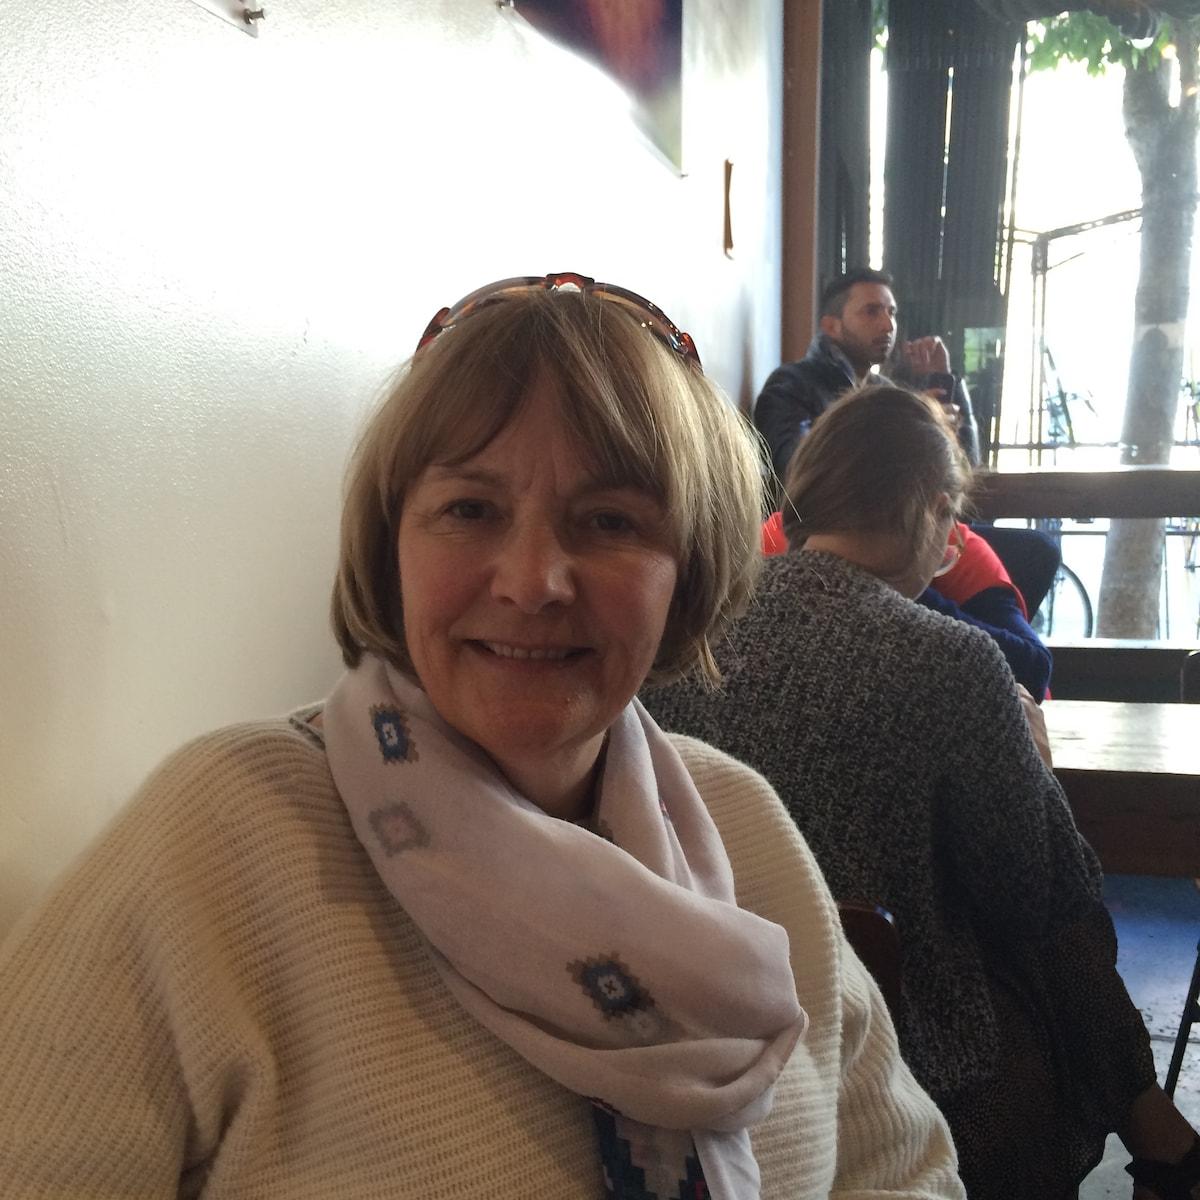 Mary Ellen From Malvern, PA